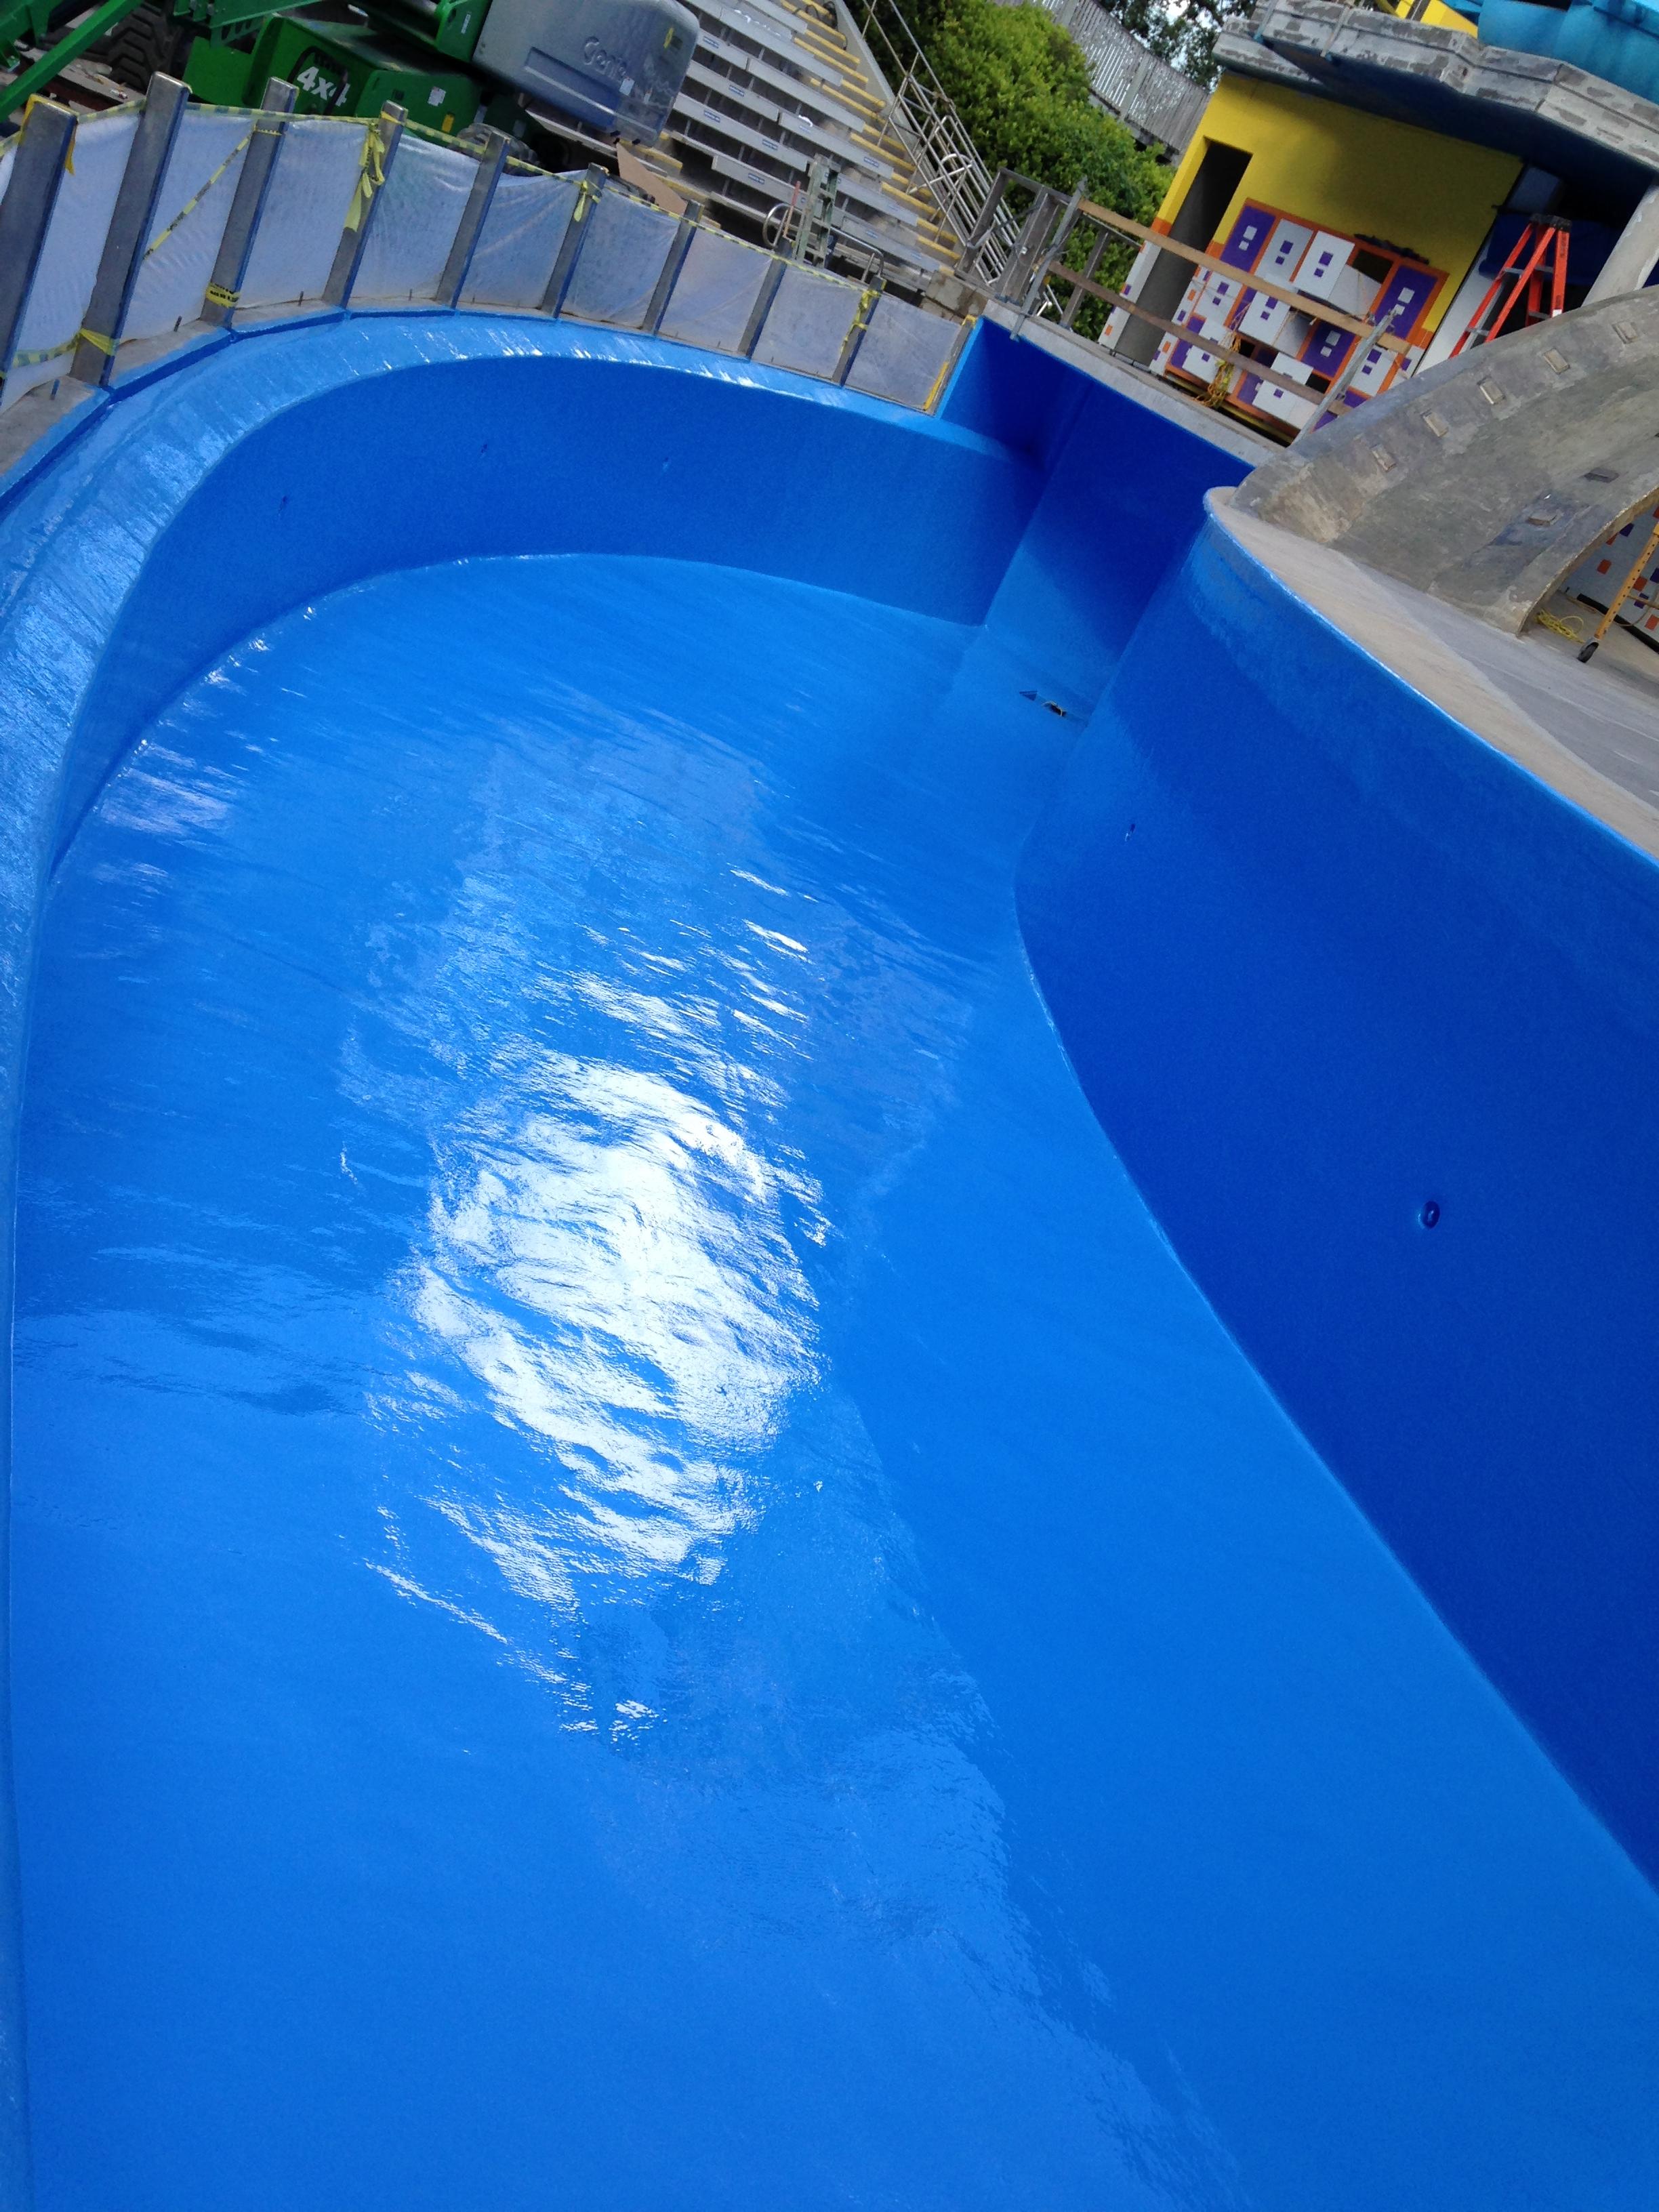 After Hotspray Waterproofing